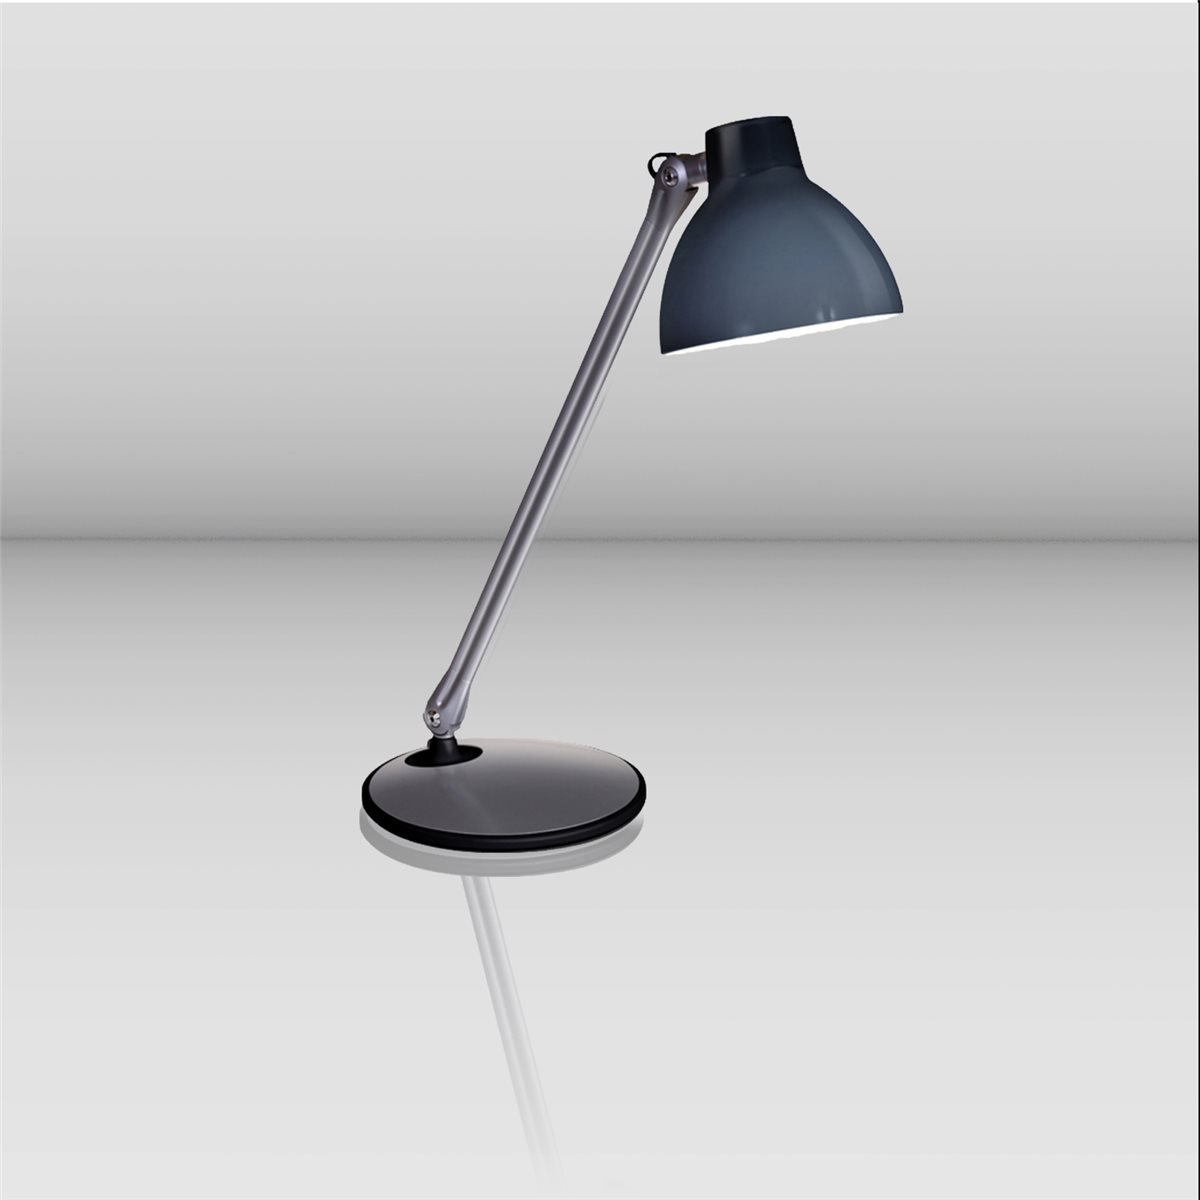 Lampenlux LED Tischlampe Selene schwenkbar drehbar Bürolampe mit Schalter E27 4W